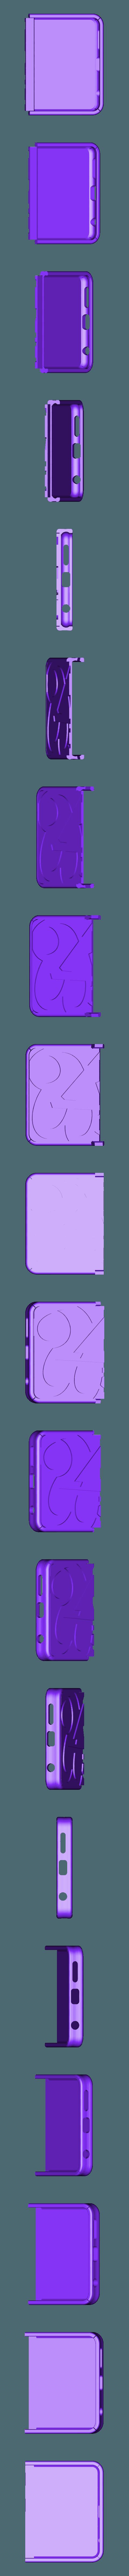 iphone6s_case_107_bottom.stl Download free STL file iPhone6 case • Design to 3D print, tofuji